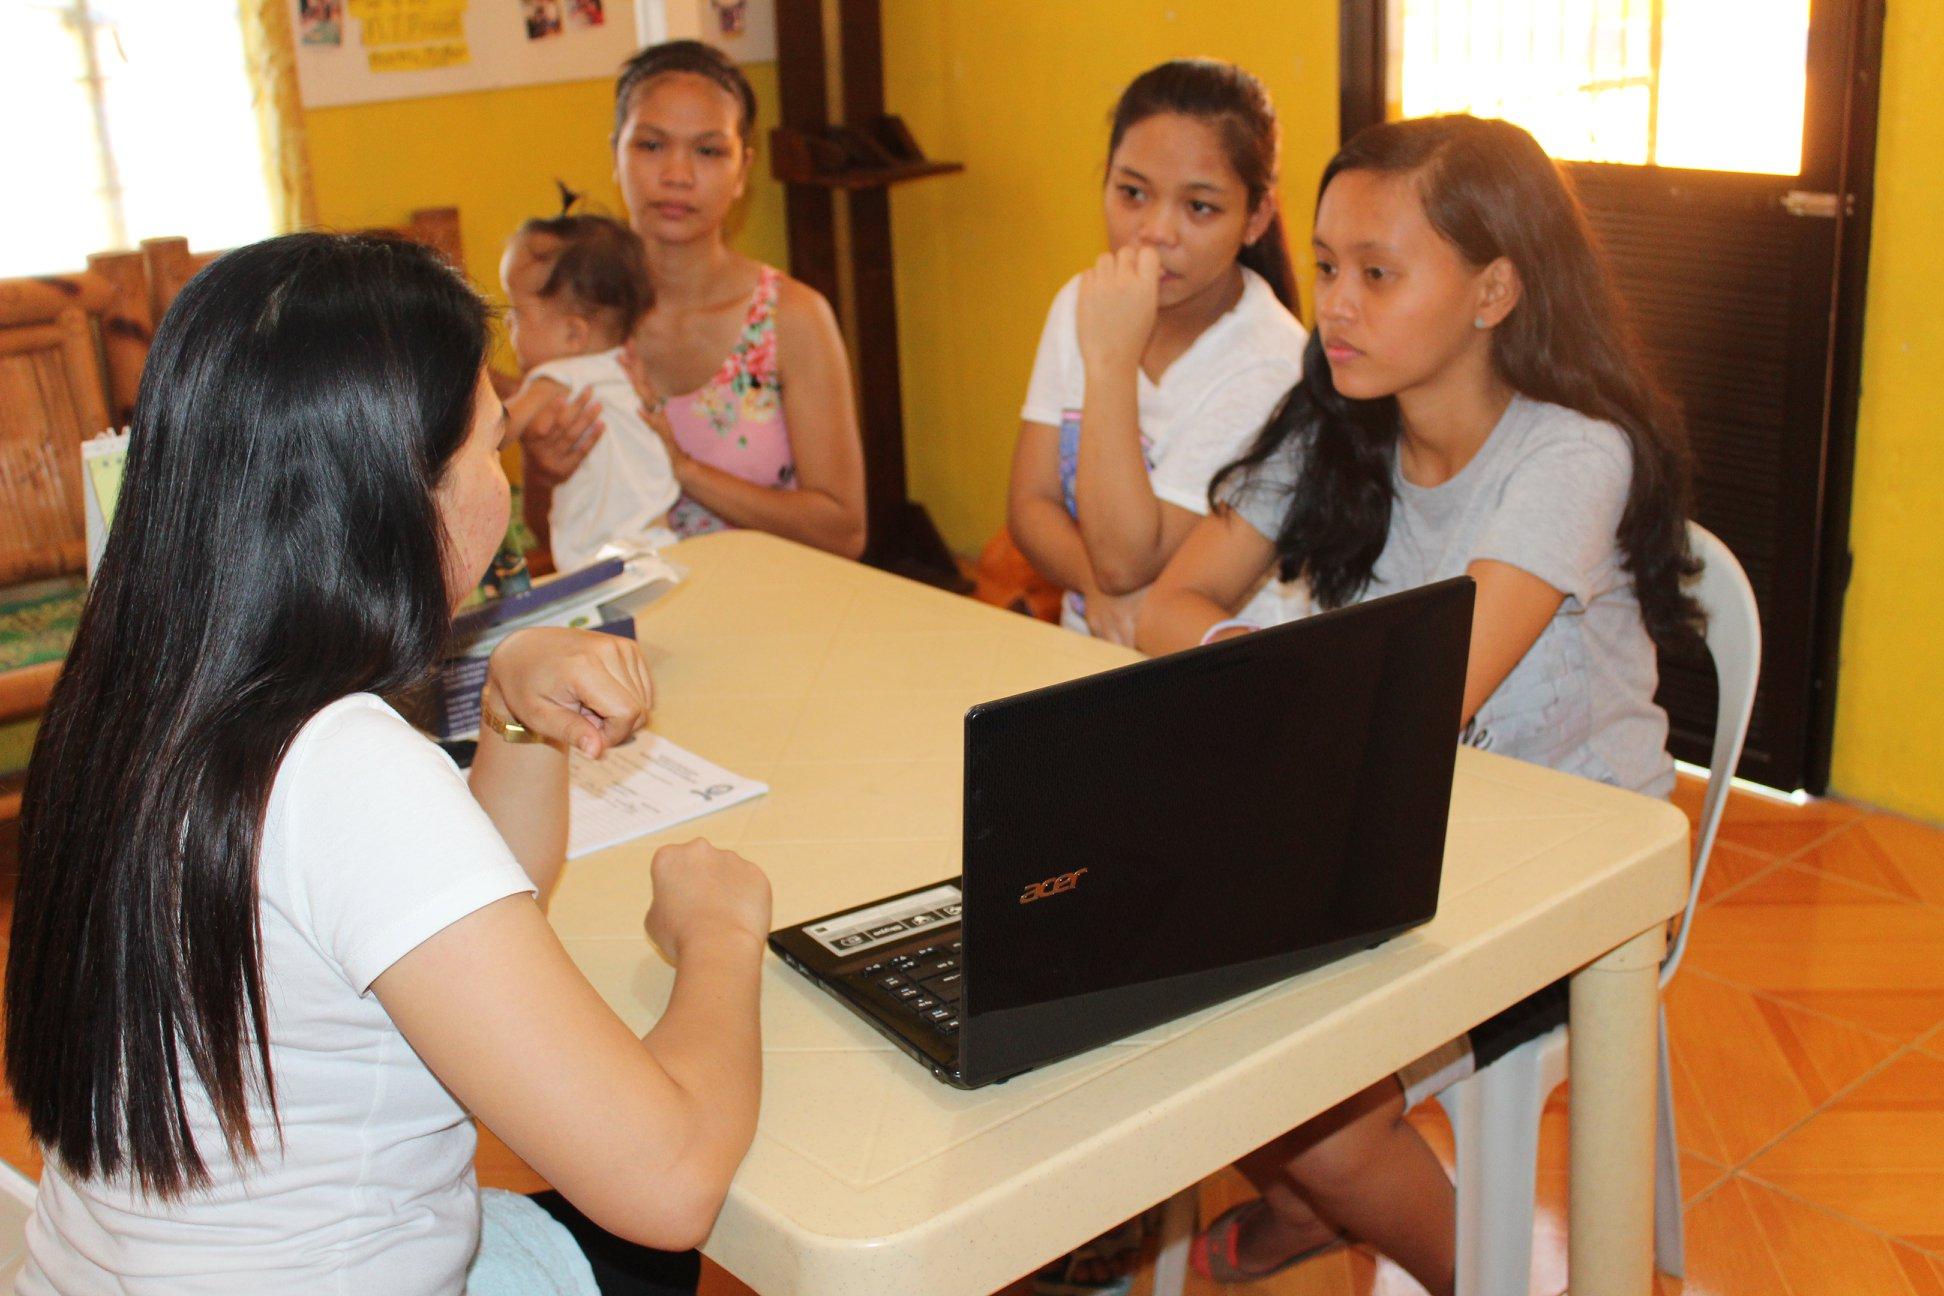 """Usapang Teenage Parents/Program For Youth Parents"" conducted for Barangays Buenlag 1st, Buenlag 2nd, Mangayao, Tamaro, Nalsian Norte and Nalsian Sur, 6.20.2019"